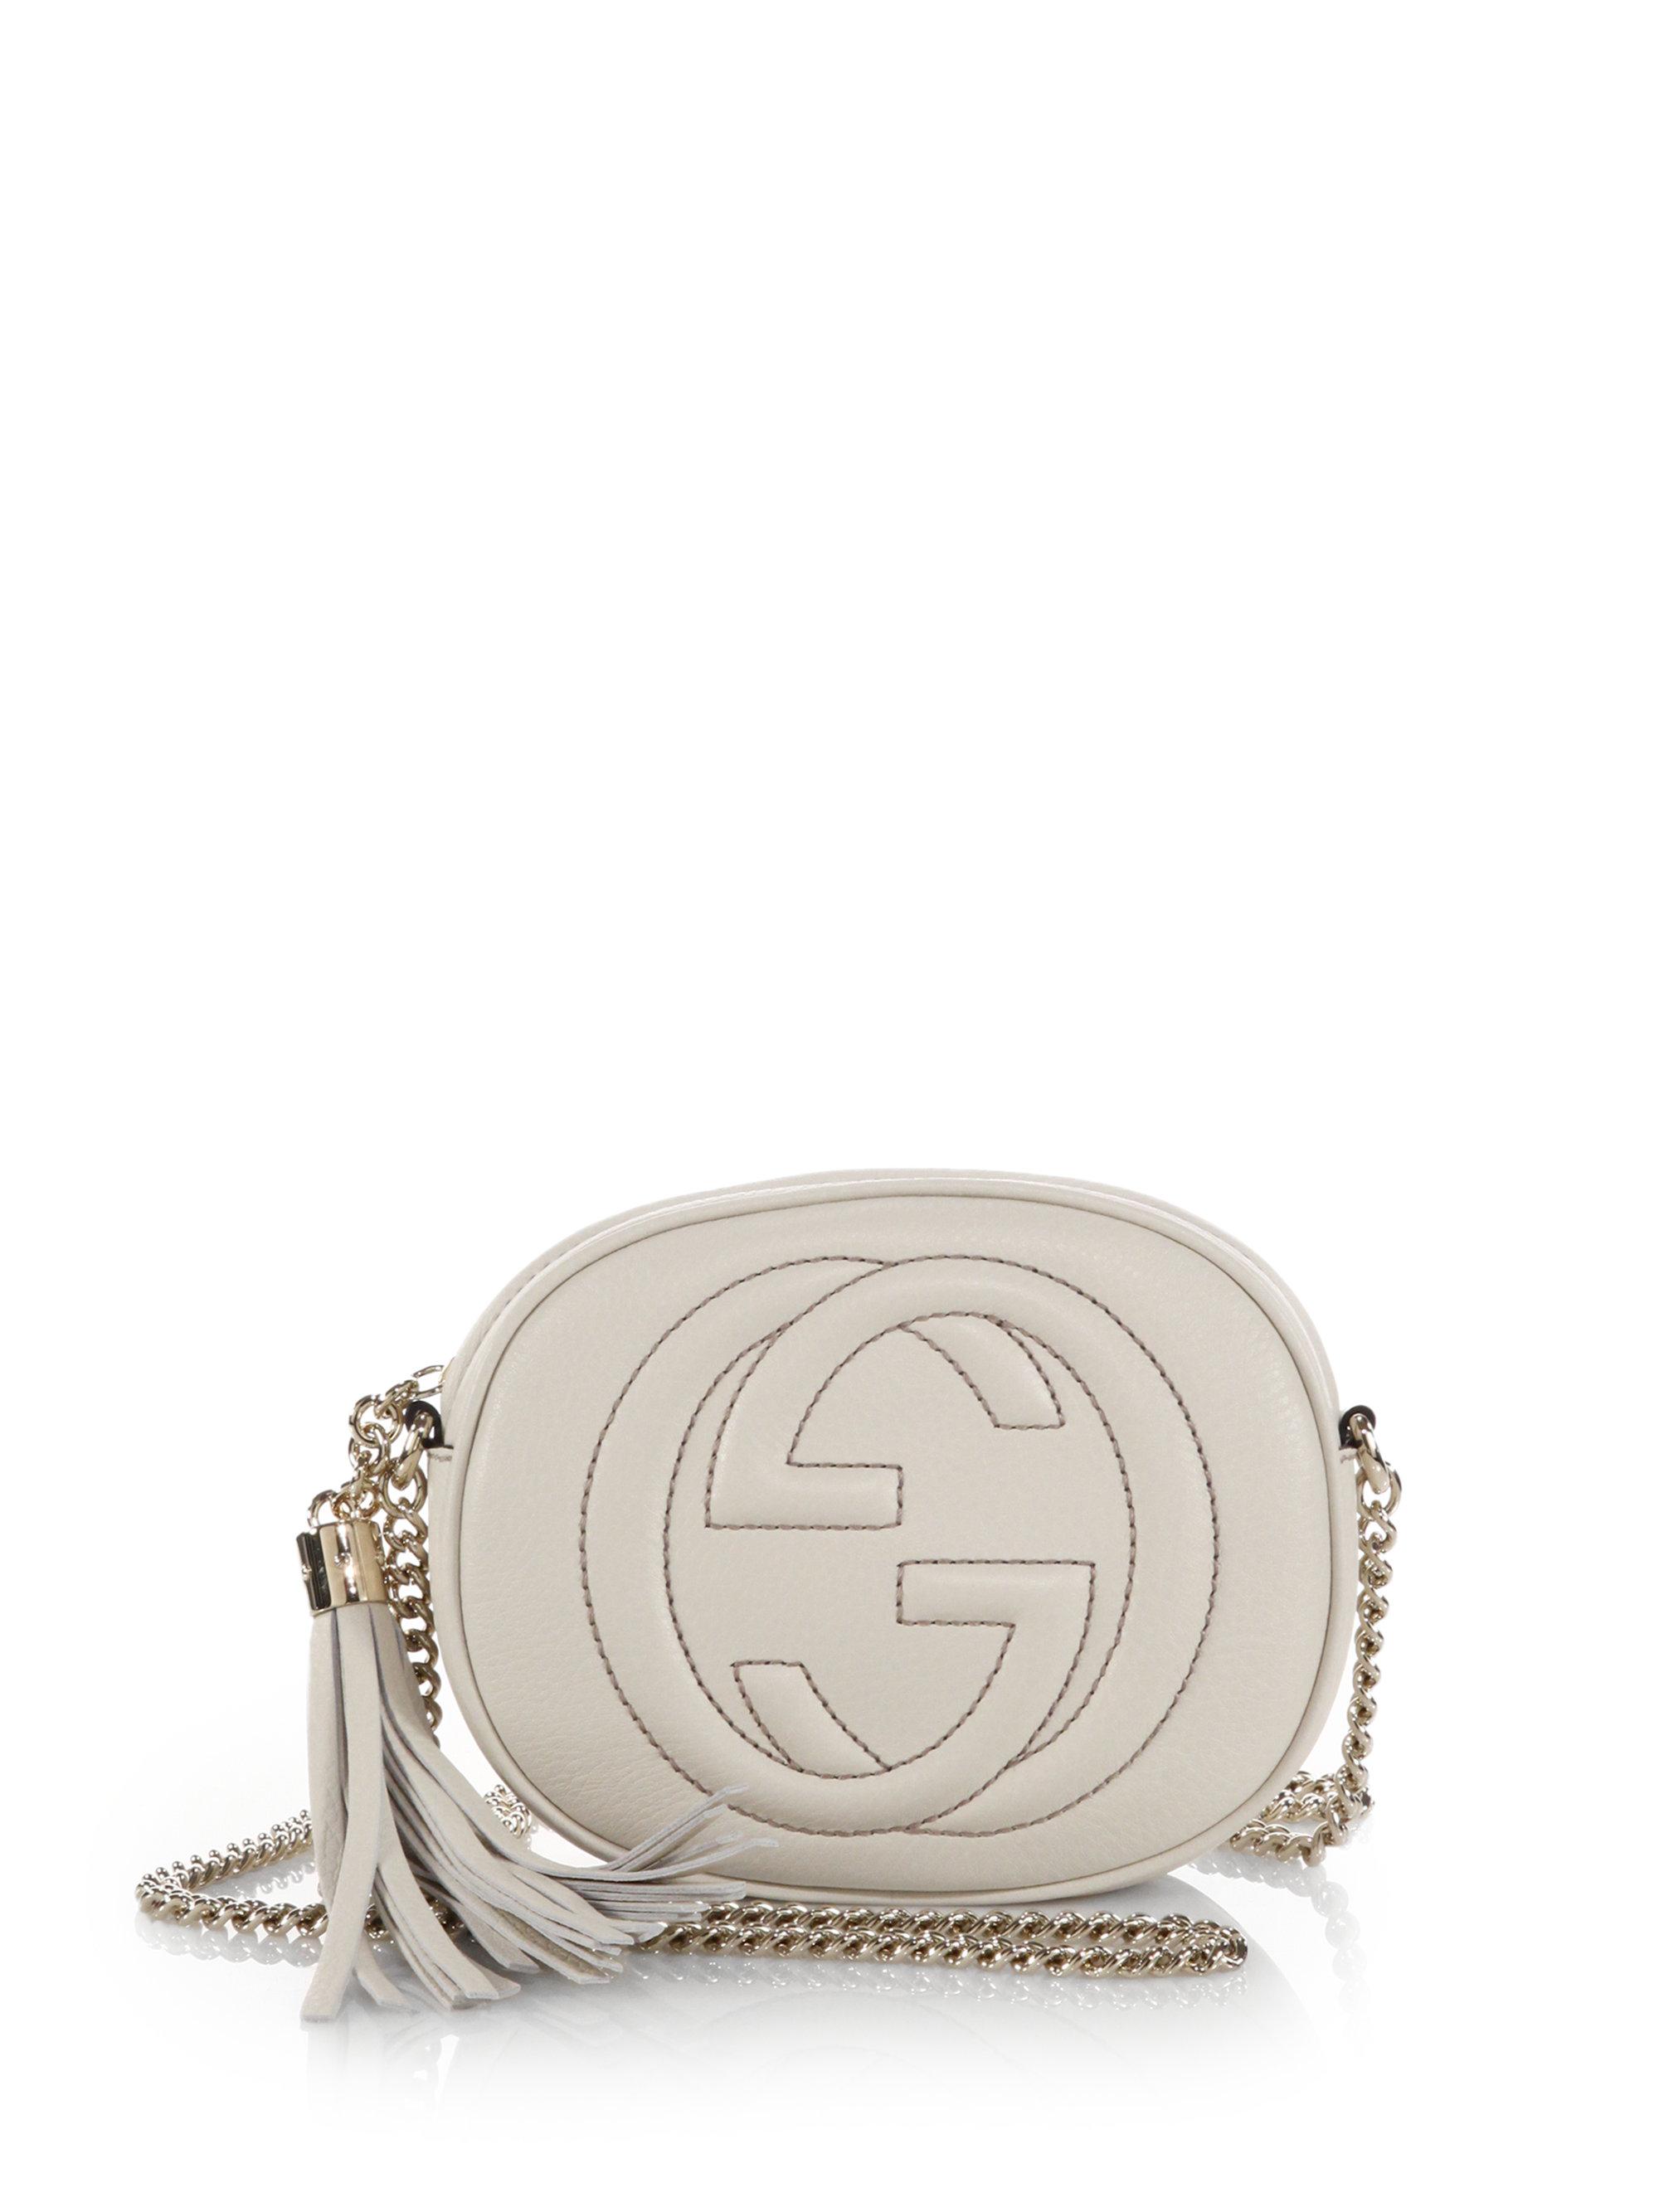 36a62597 Gucci White Soho Leather Mini Chain Bag